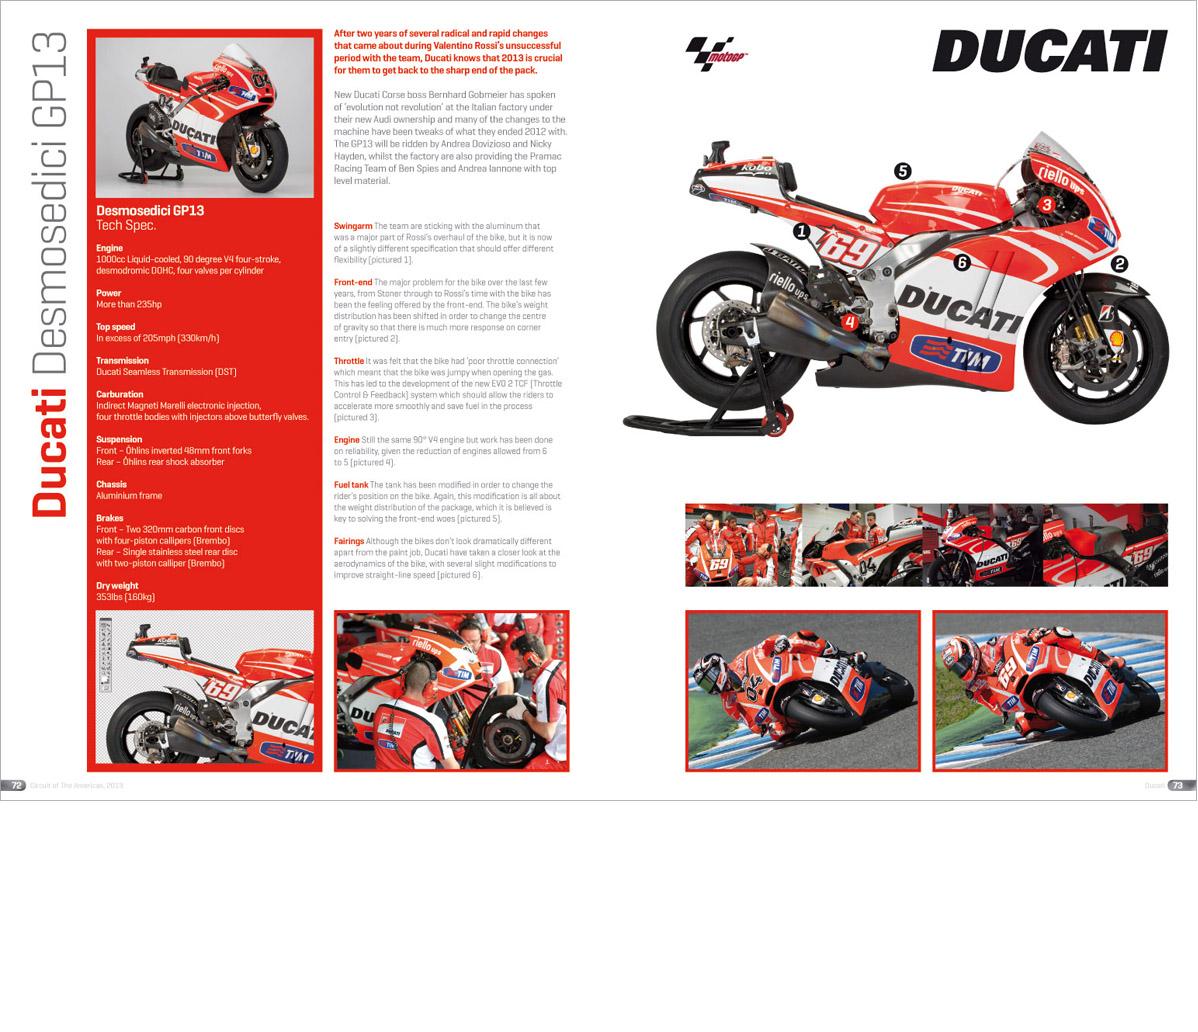 MotoGPTexas2013_DucatiTest